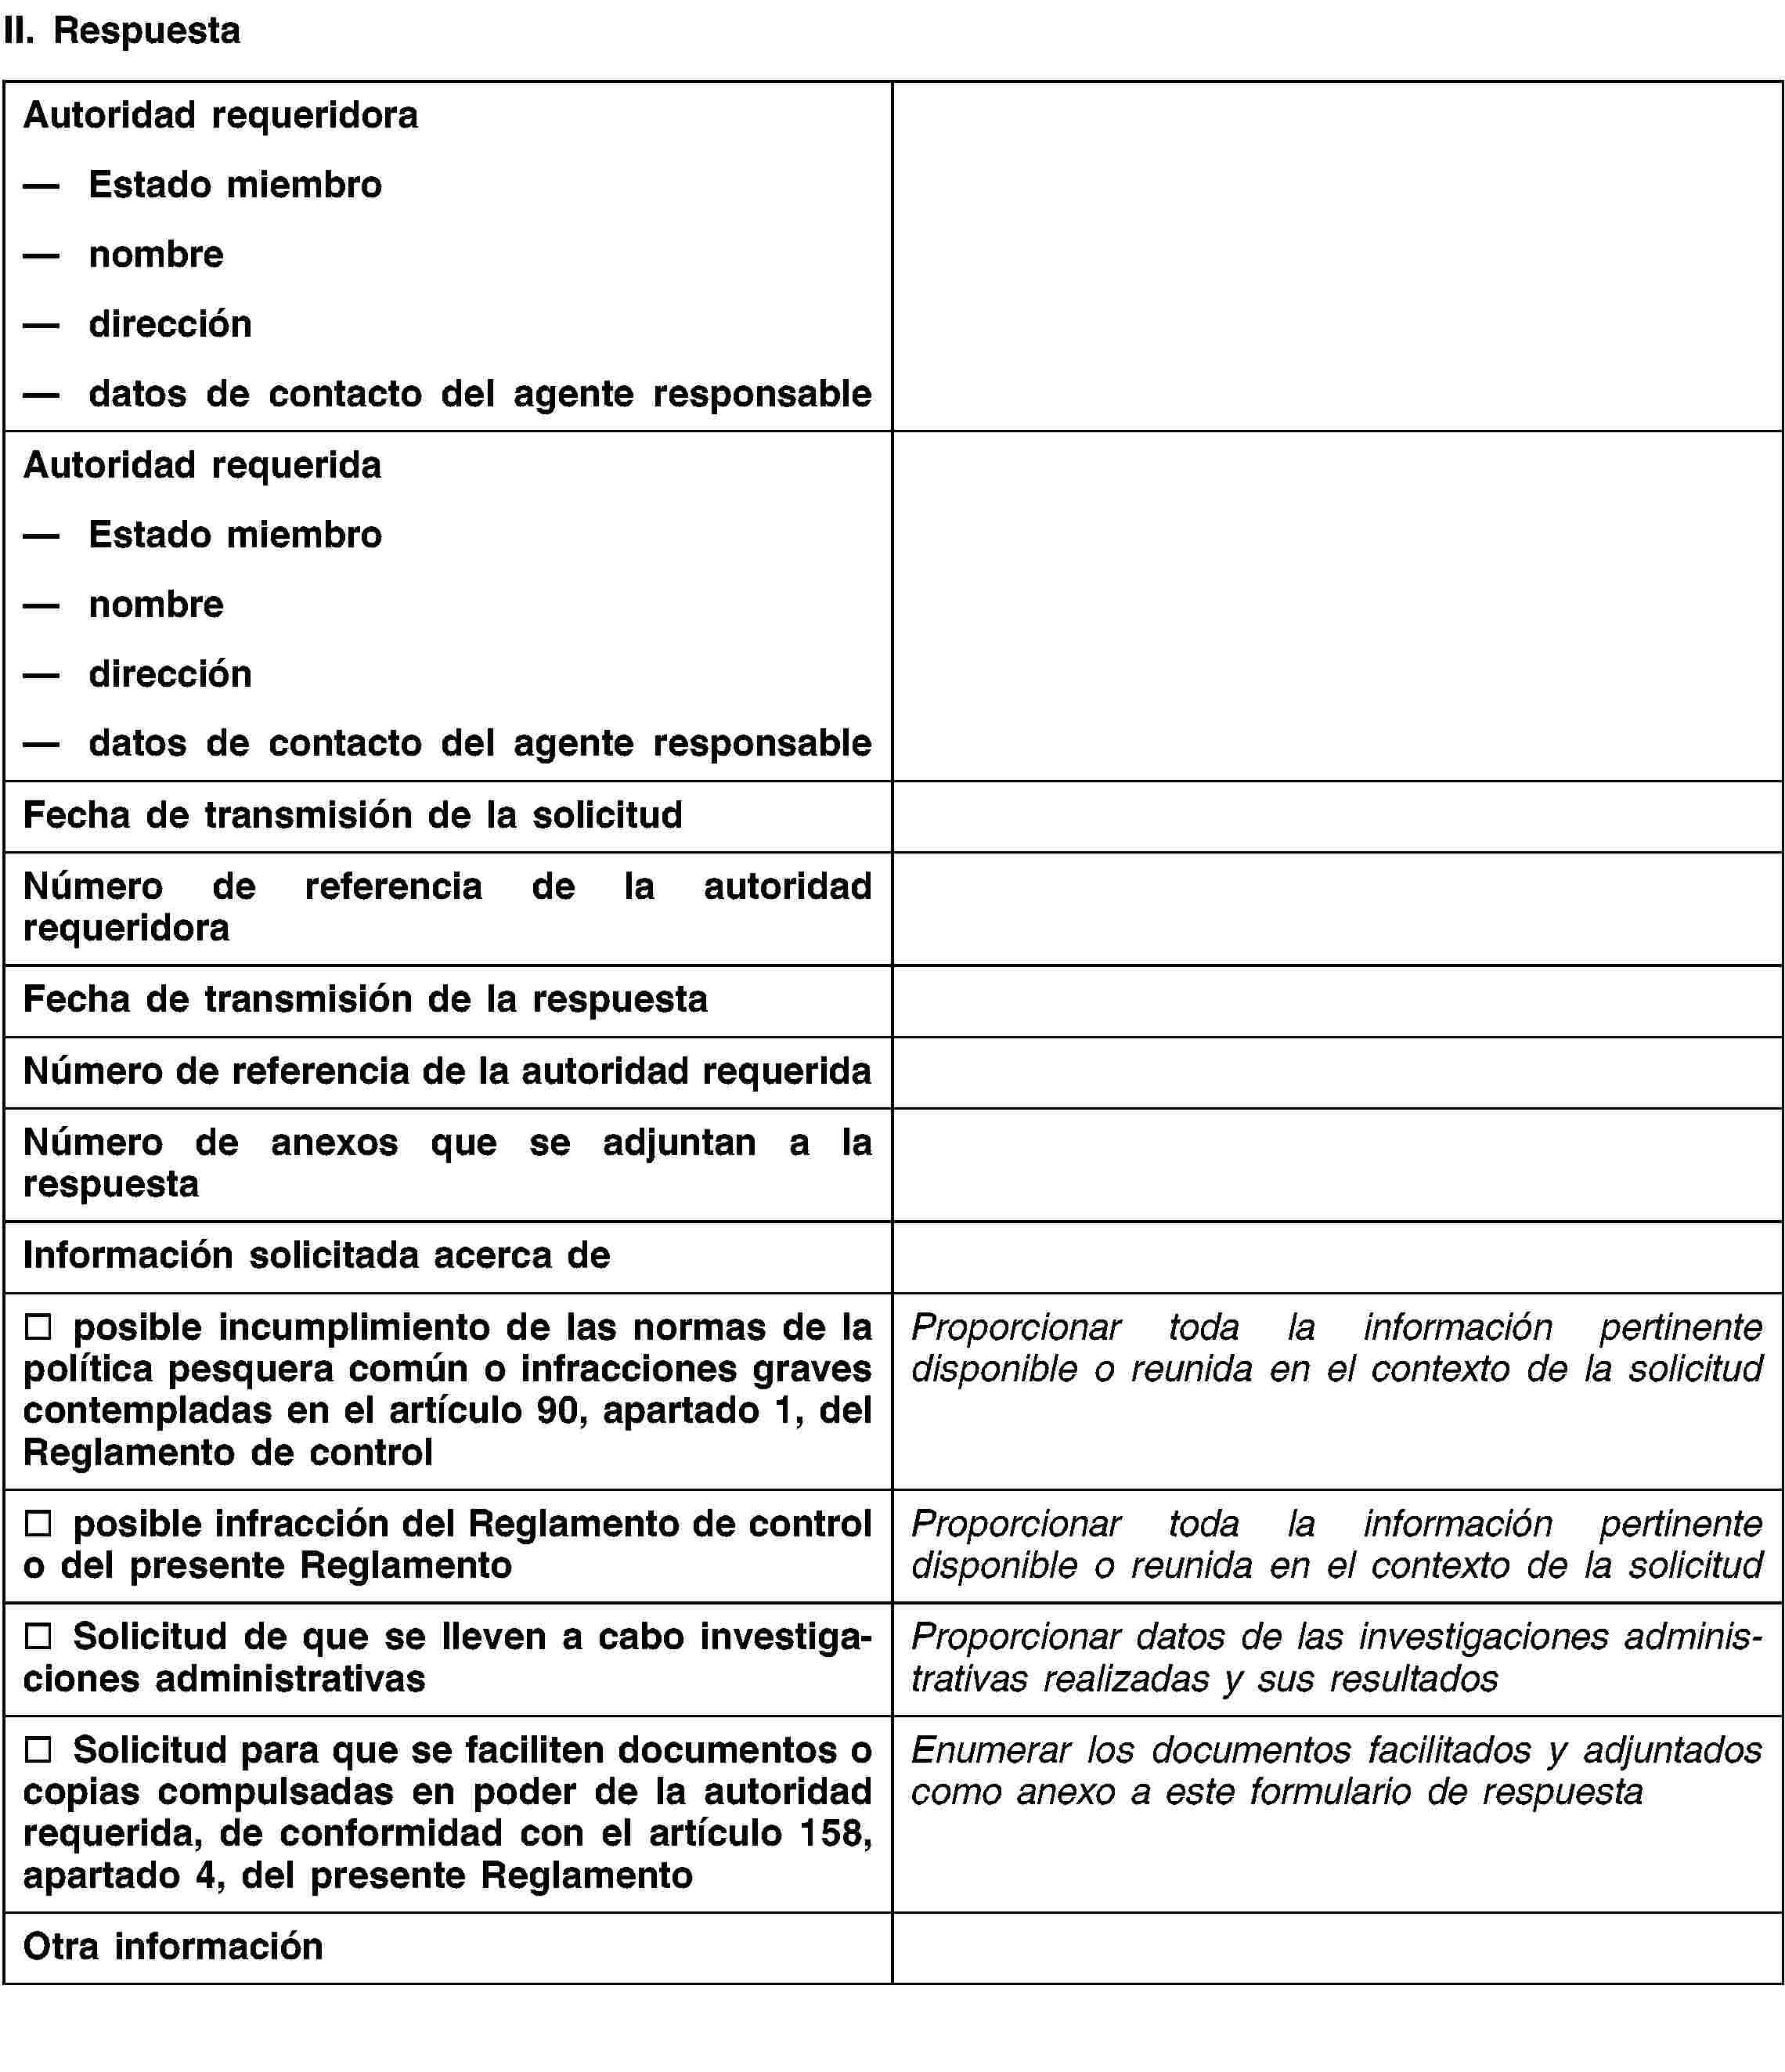 EUR-Lex - 02011R0404-20110507 - EN - EUR-Lex